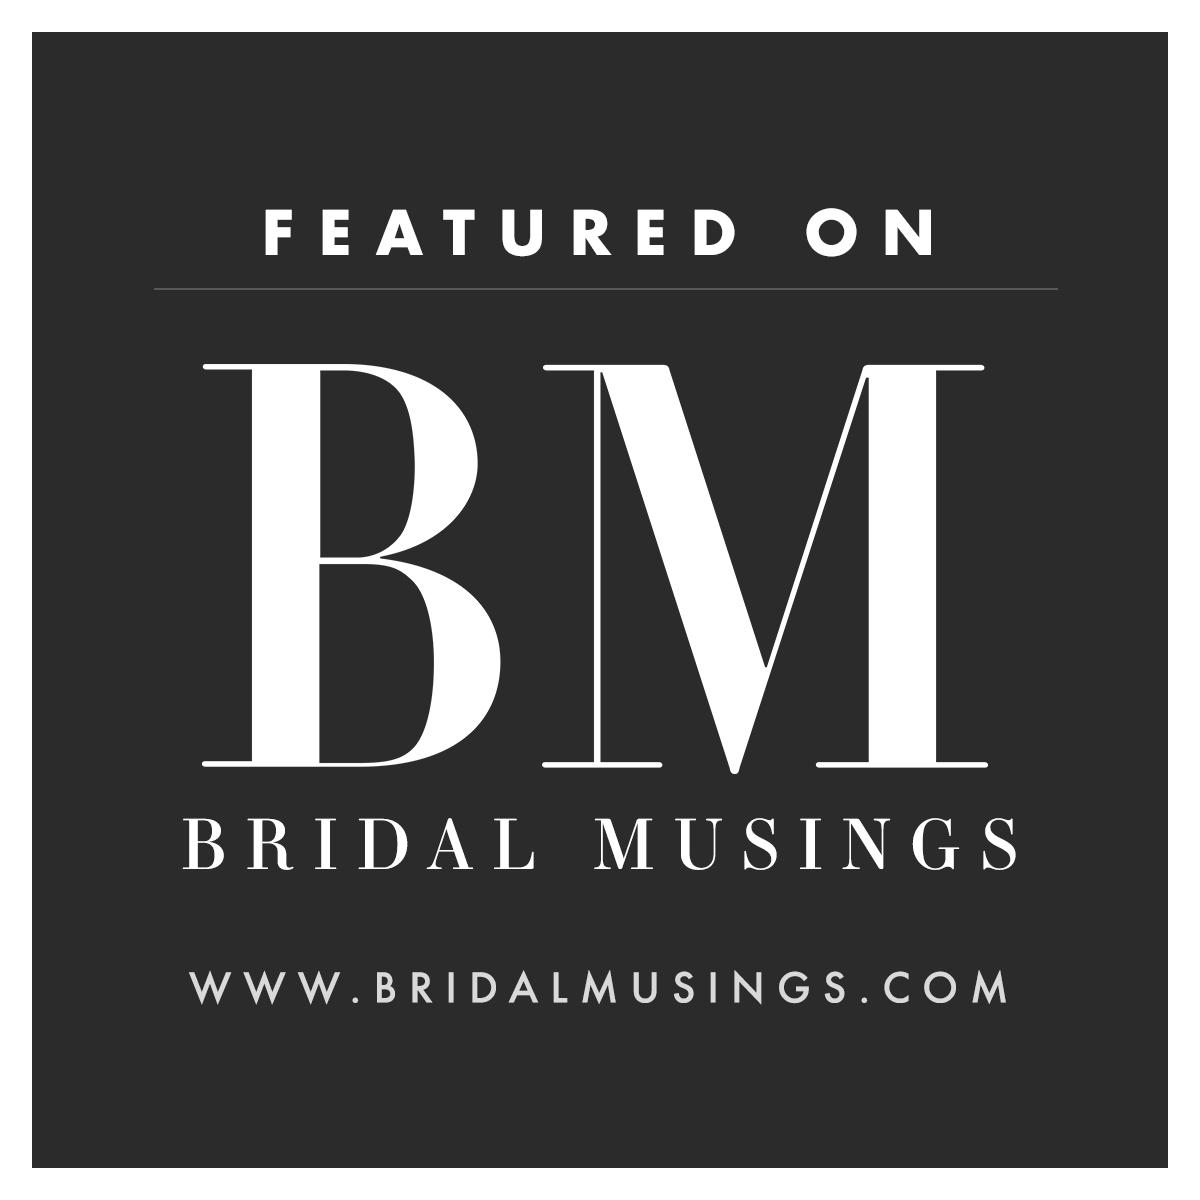 Image result for bridal musings logo